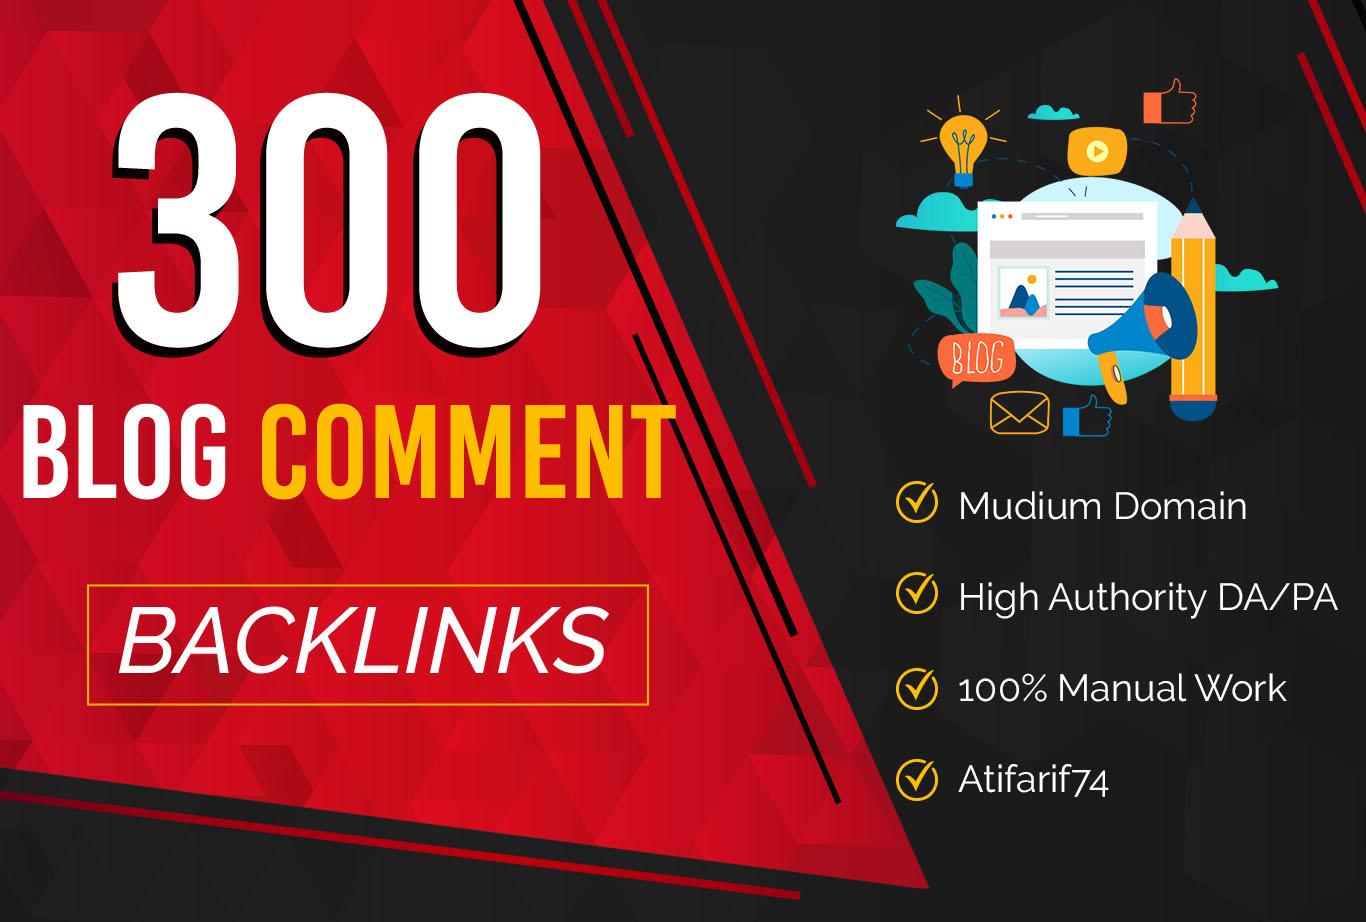 I will Provide 50 Blog Comments Backlinks on High DA PA Blog